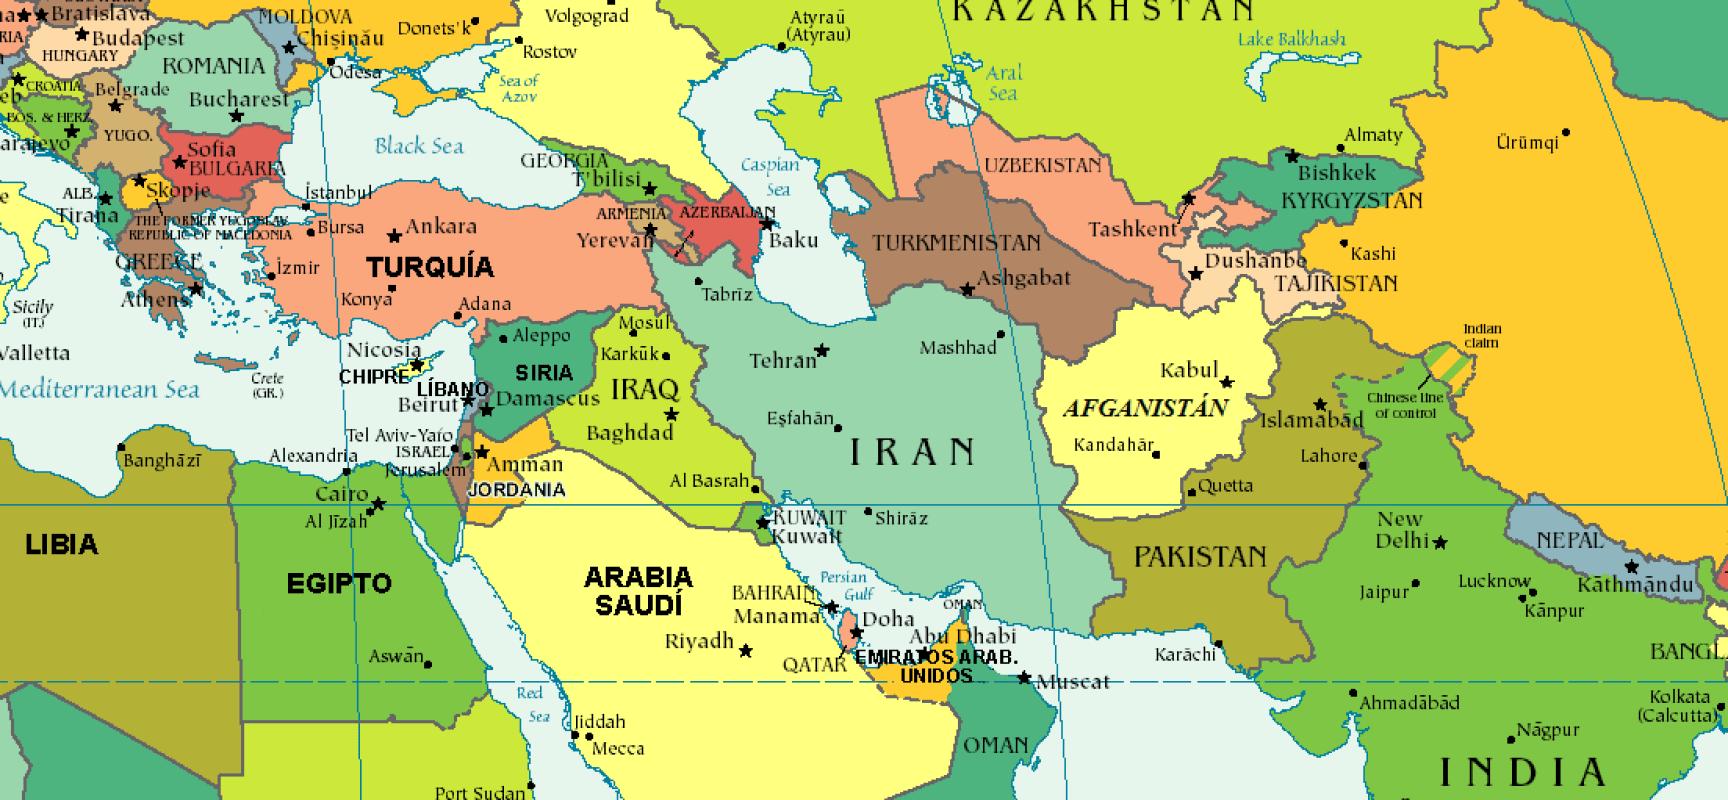 Intervention russe en Irak imminente?